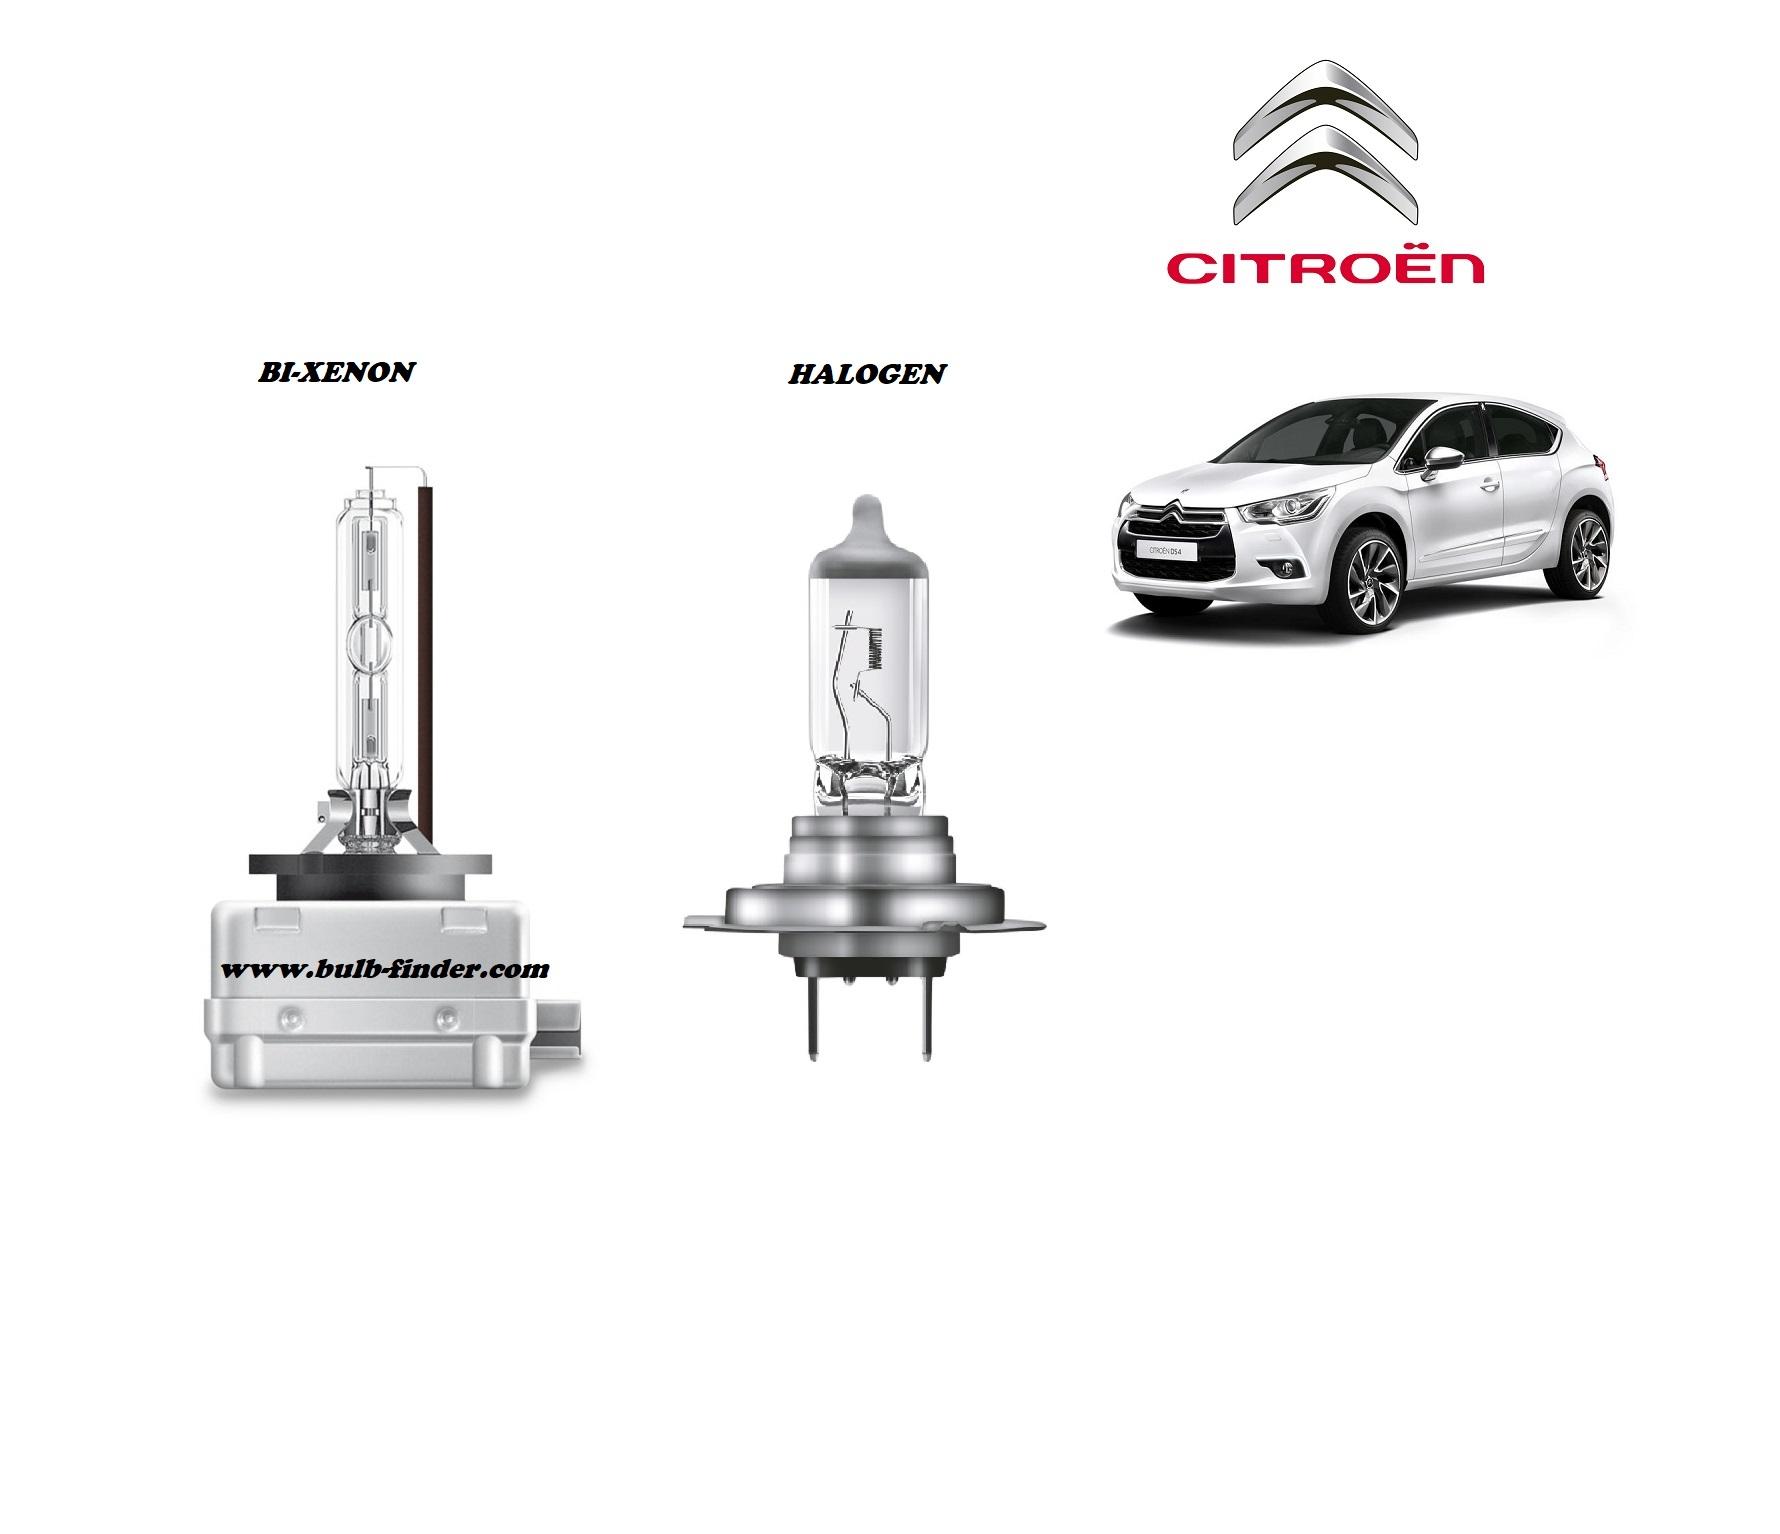 Citroen DS4 bulb type LOW BEAM HEADLIGHT